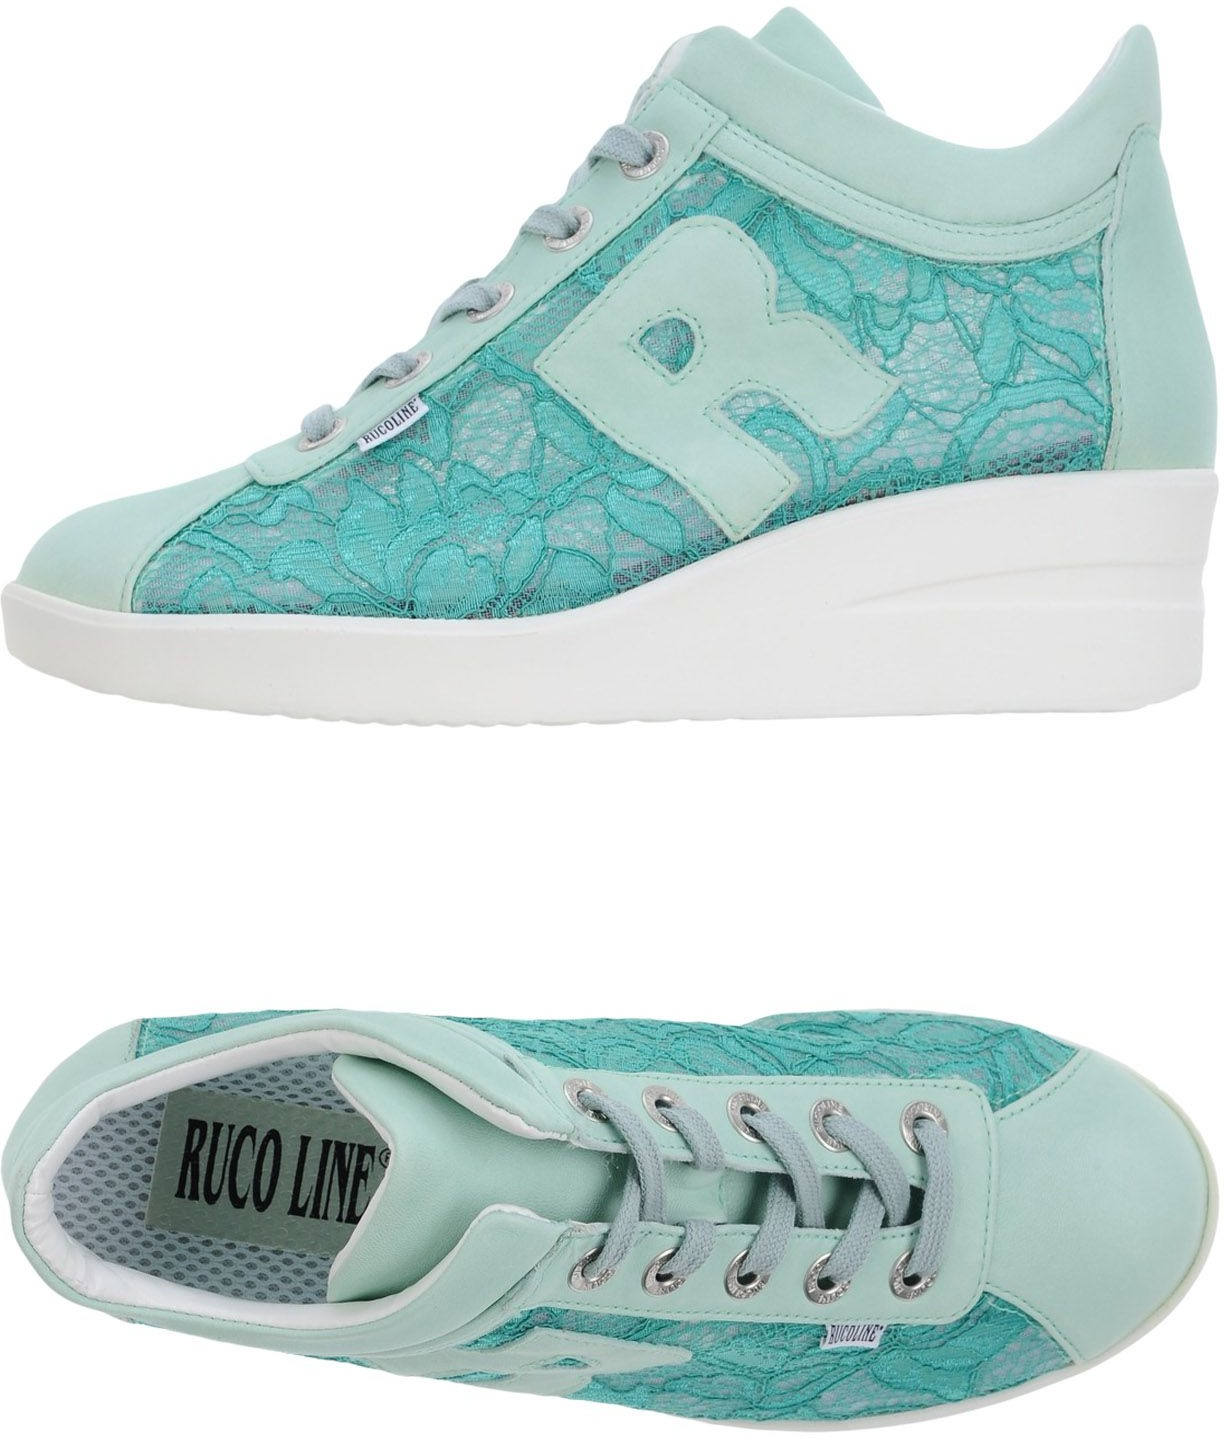 RUCO LINE - CALZATURE - Sneakers   Tennis shoes alte -  384eea0fa97